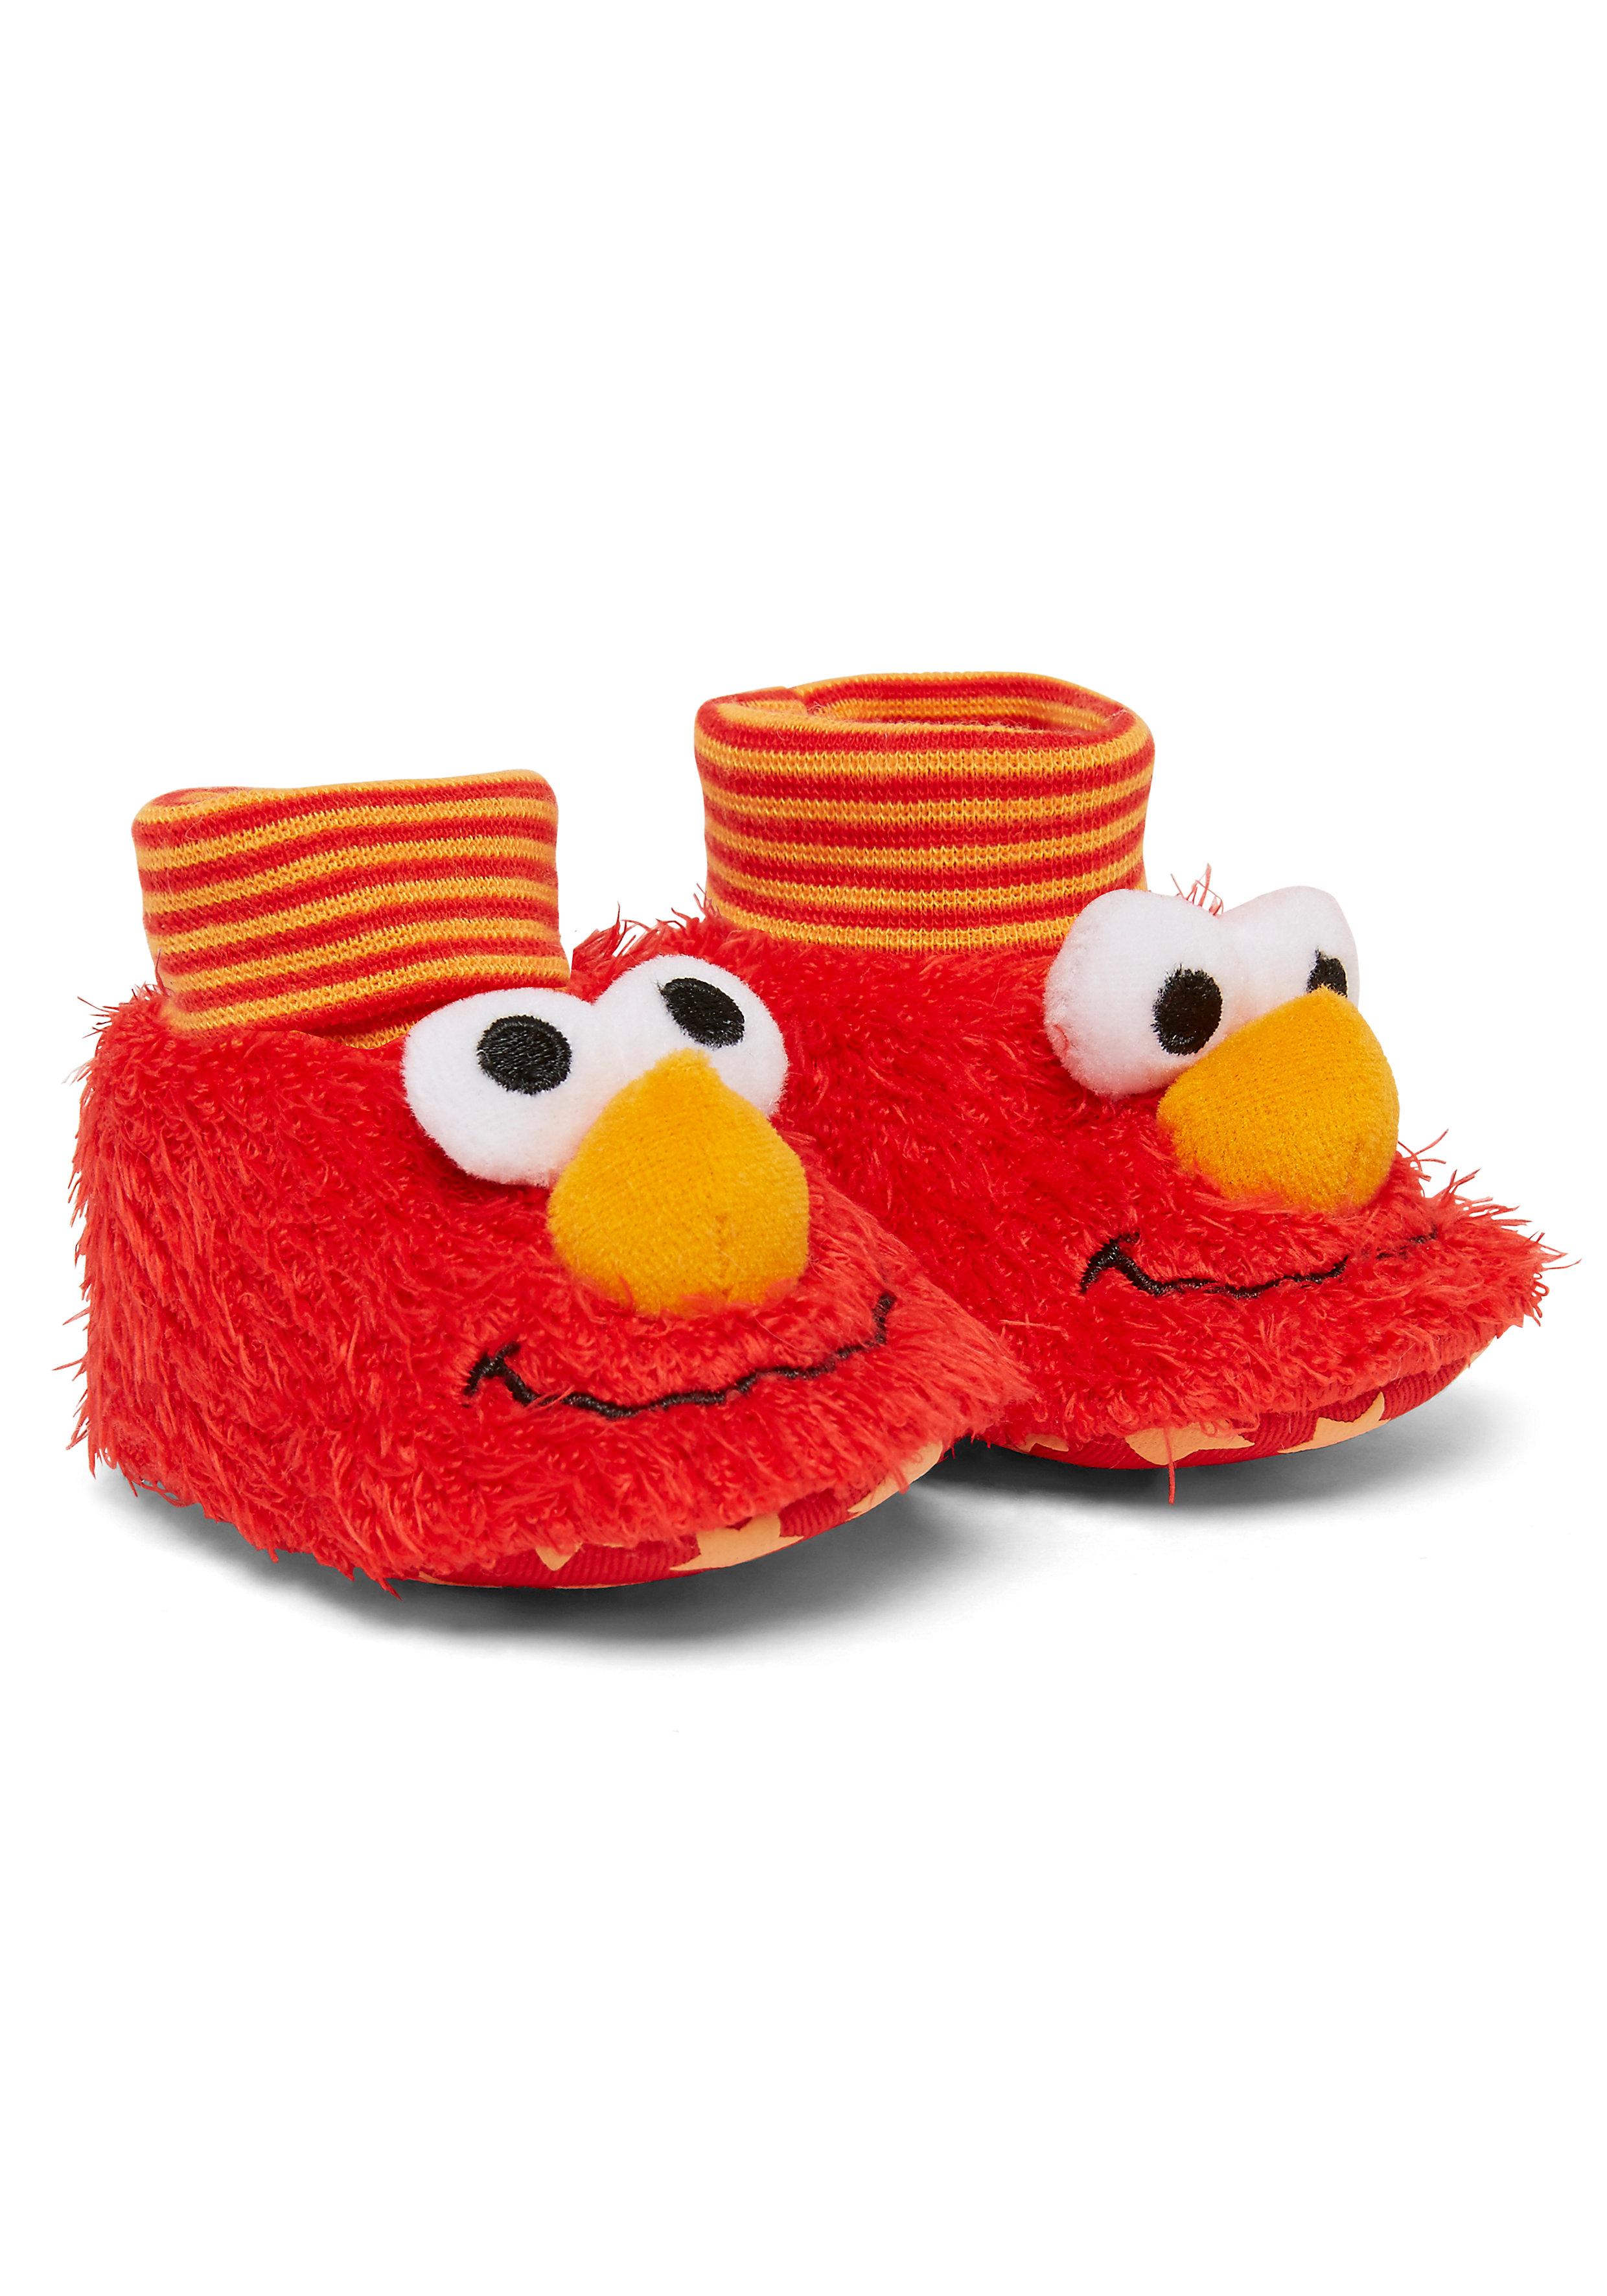 Mothercare | Unisex Sesame Street Elmo Booties - Red